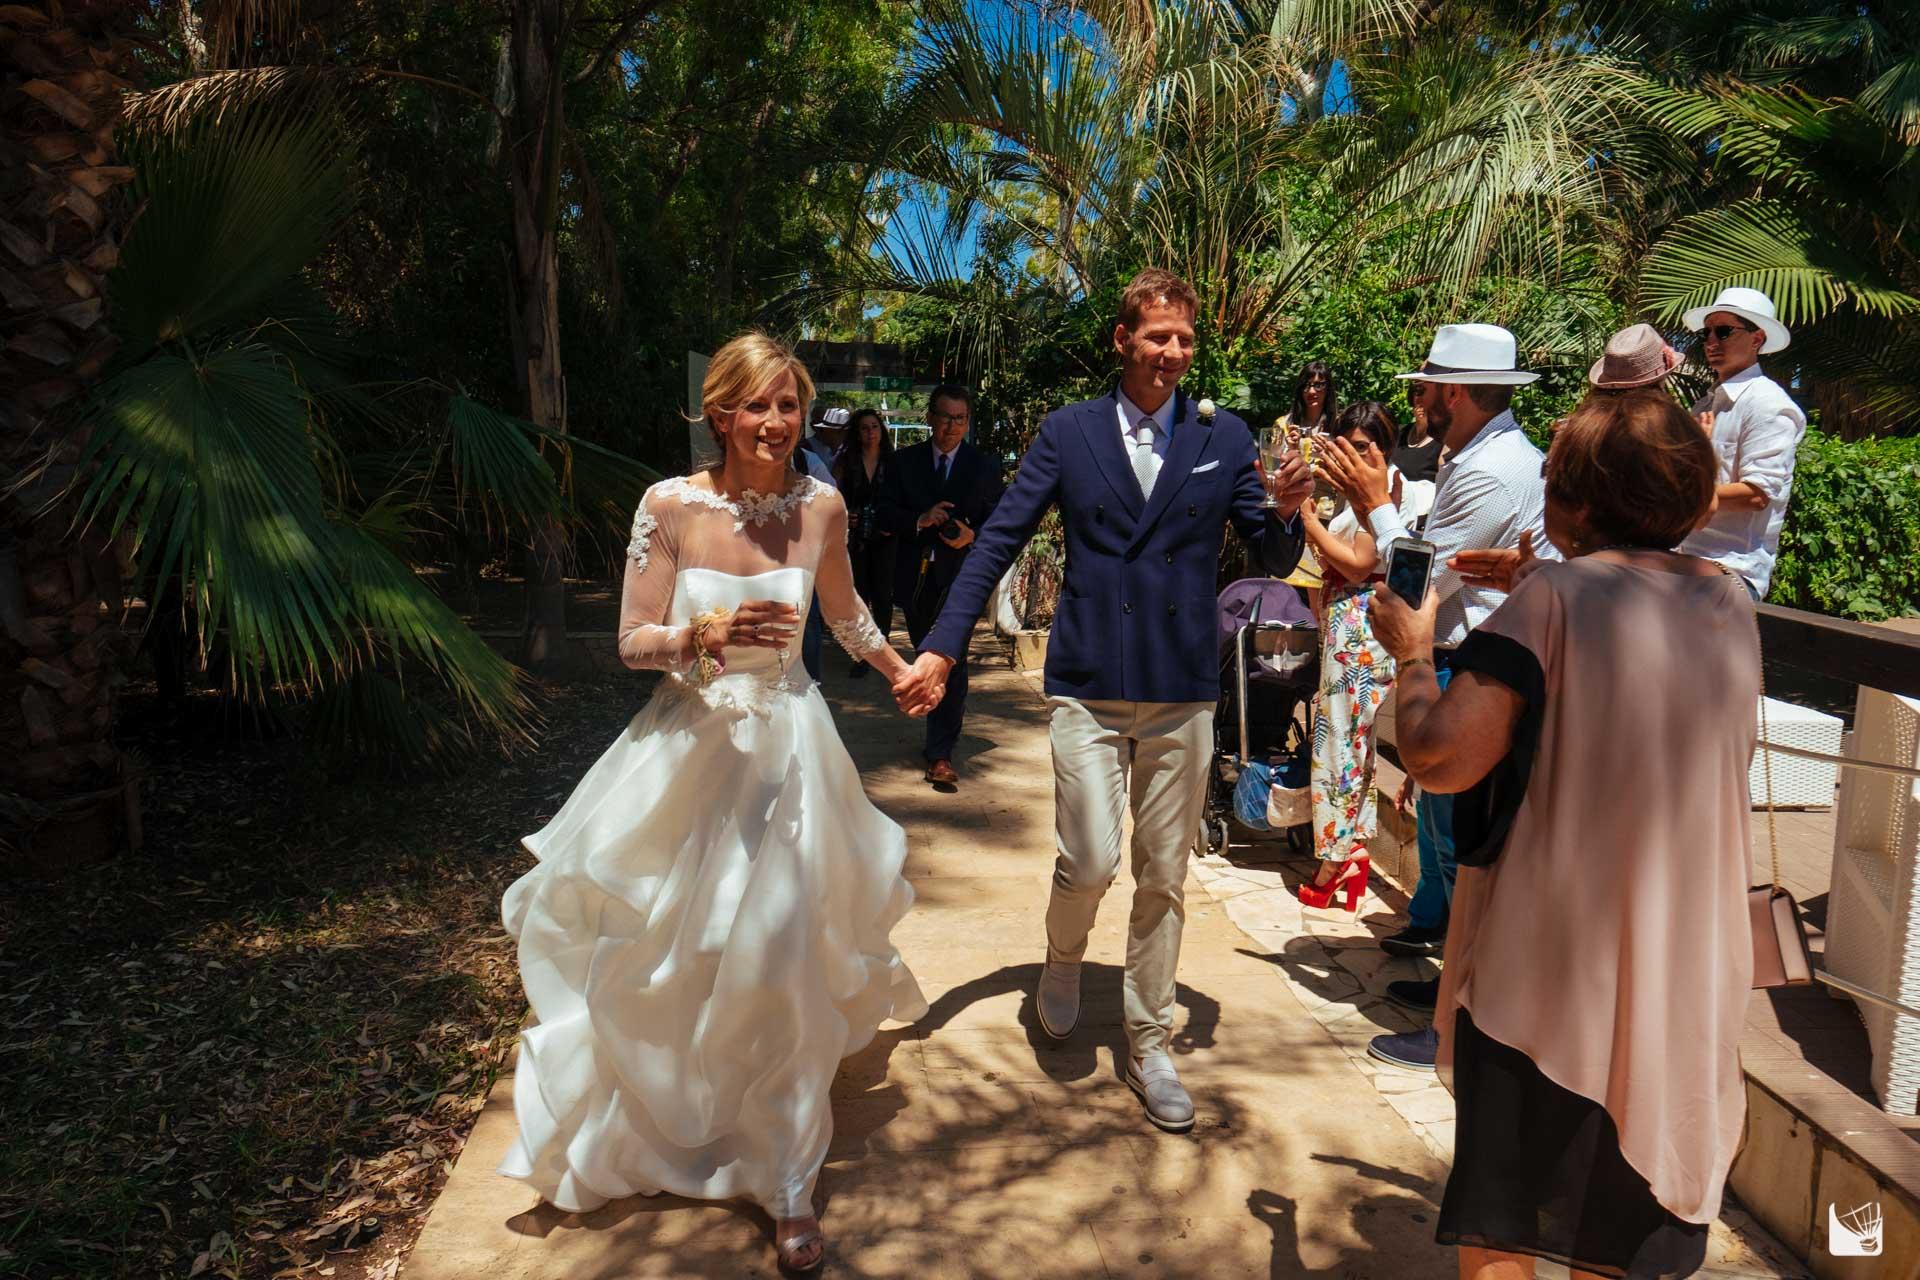 wedding_in_marzamemi-36.jpg